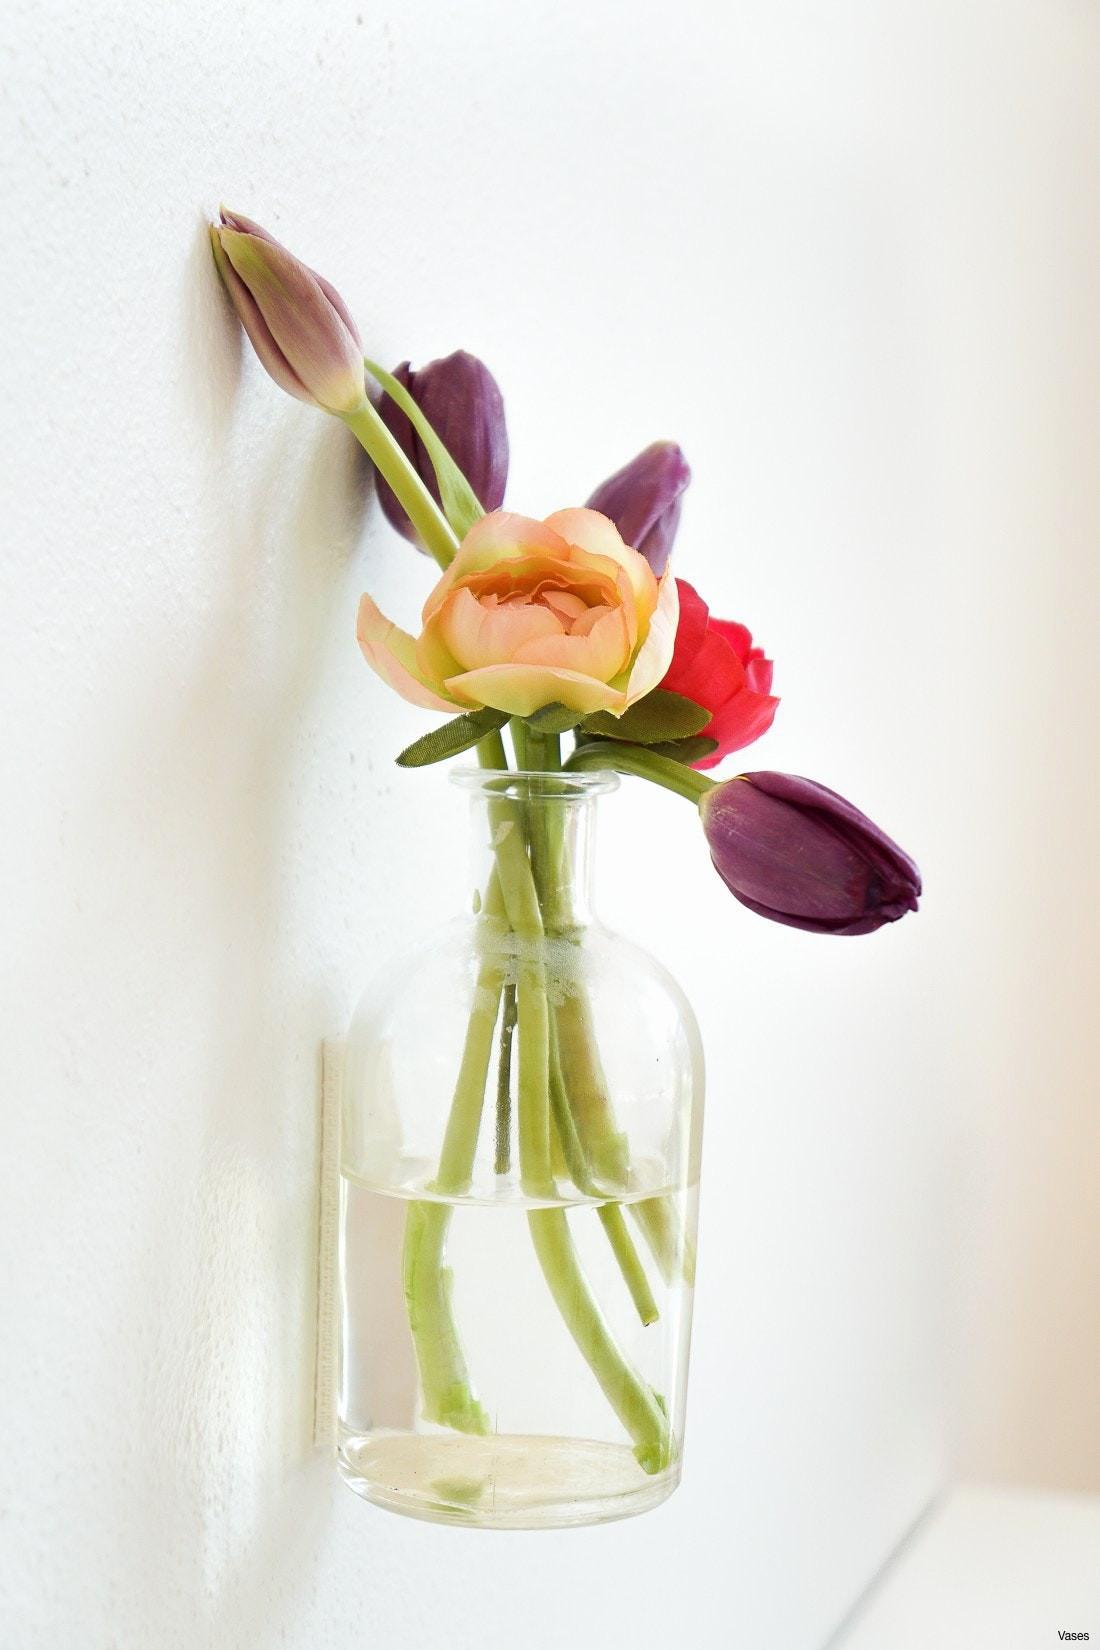 Round Vase Flower Arrangements Of Metal Vase Wall Decor Pics H Vases Artificial Flower Arrangements I Throughout Metal Vase Wall Decor Pics Metal Wall Art Panels Fresh 1 Kirkland Wall Decor Home Design